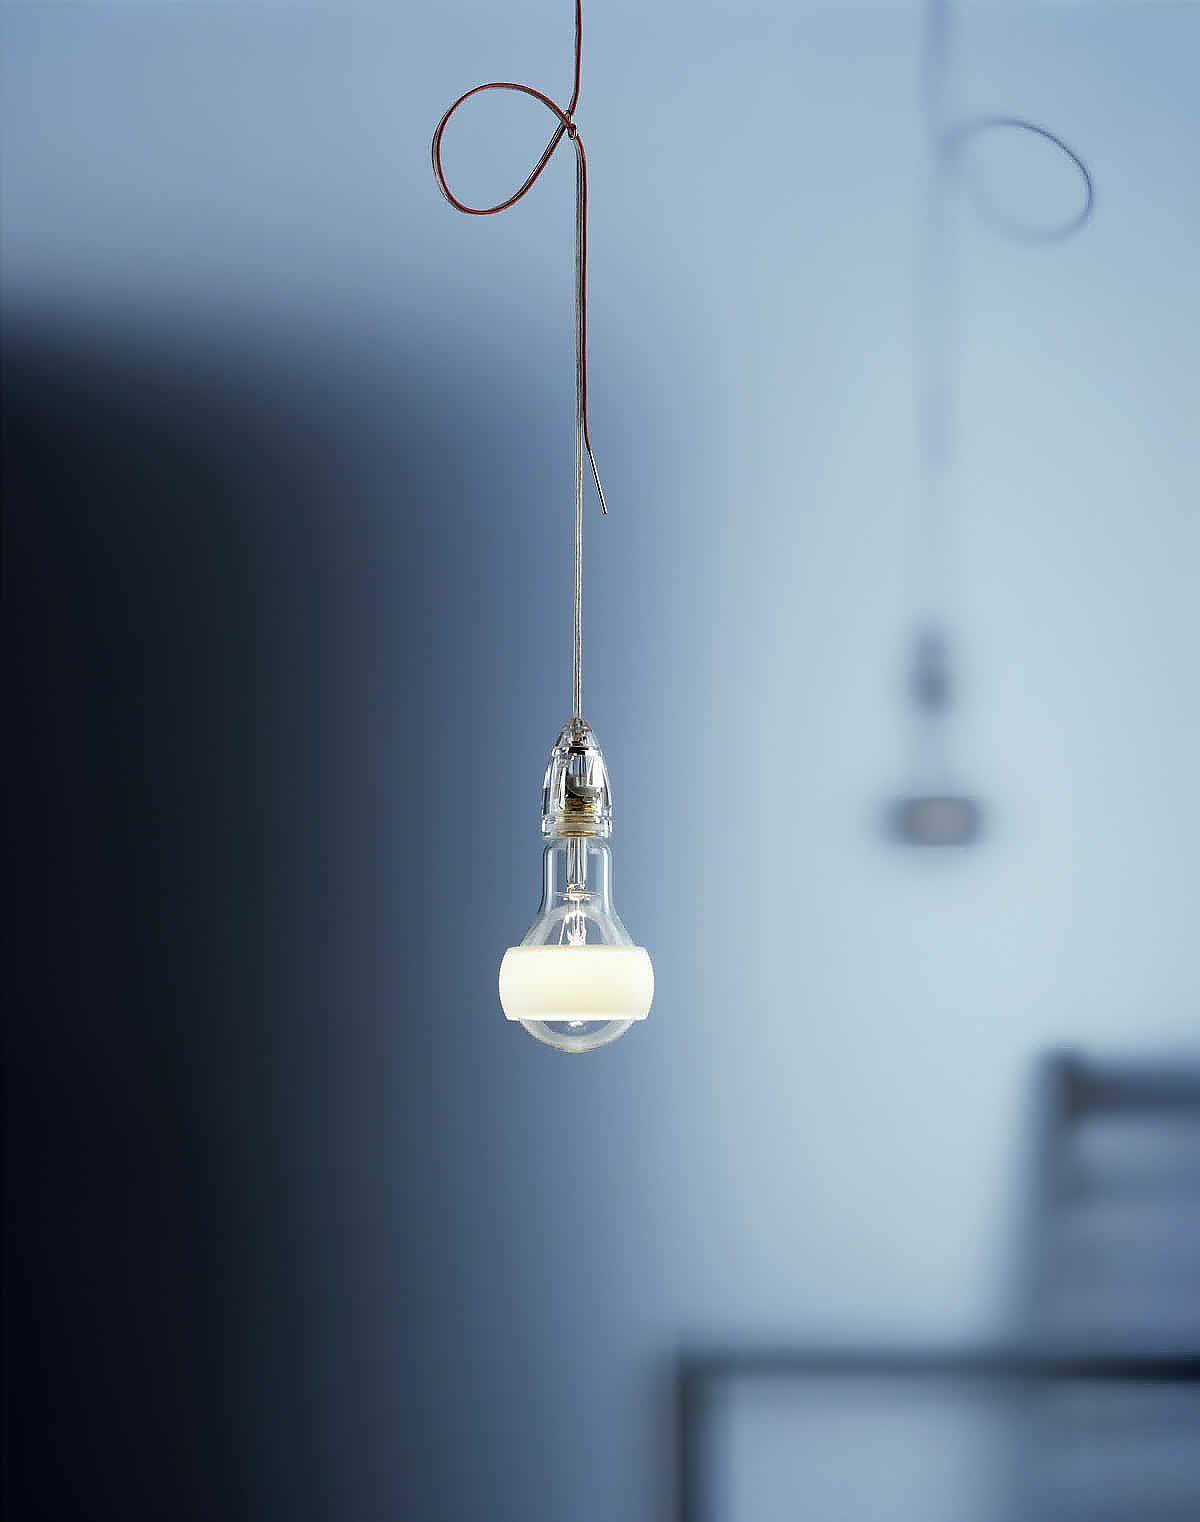 Captivating Johnny B. Good   Produkte   Ingo Maurer GmbH · Lighting DesignLighting ... Good Looking